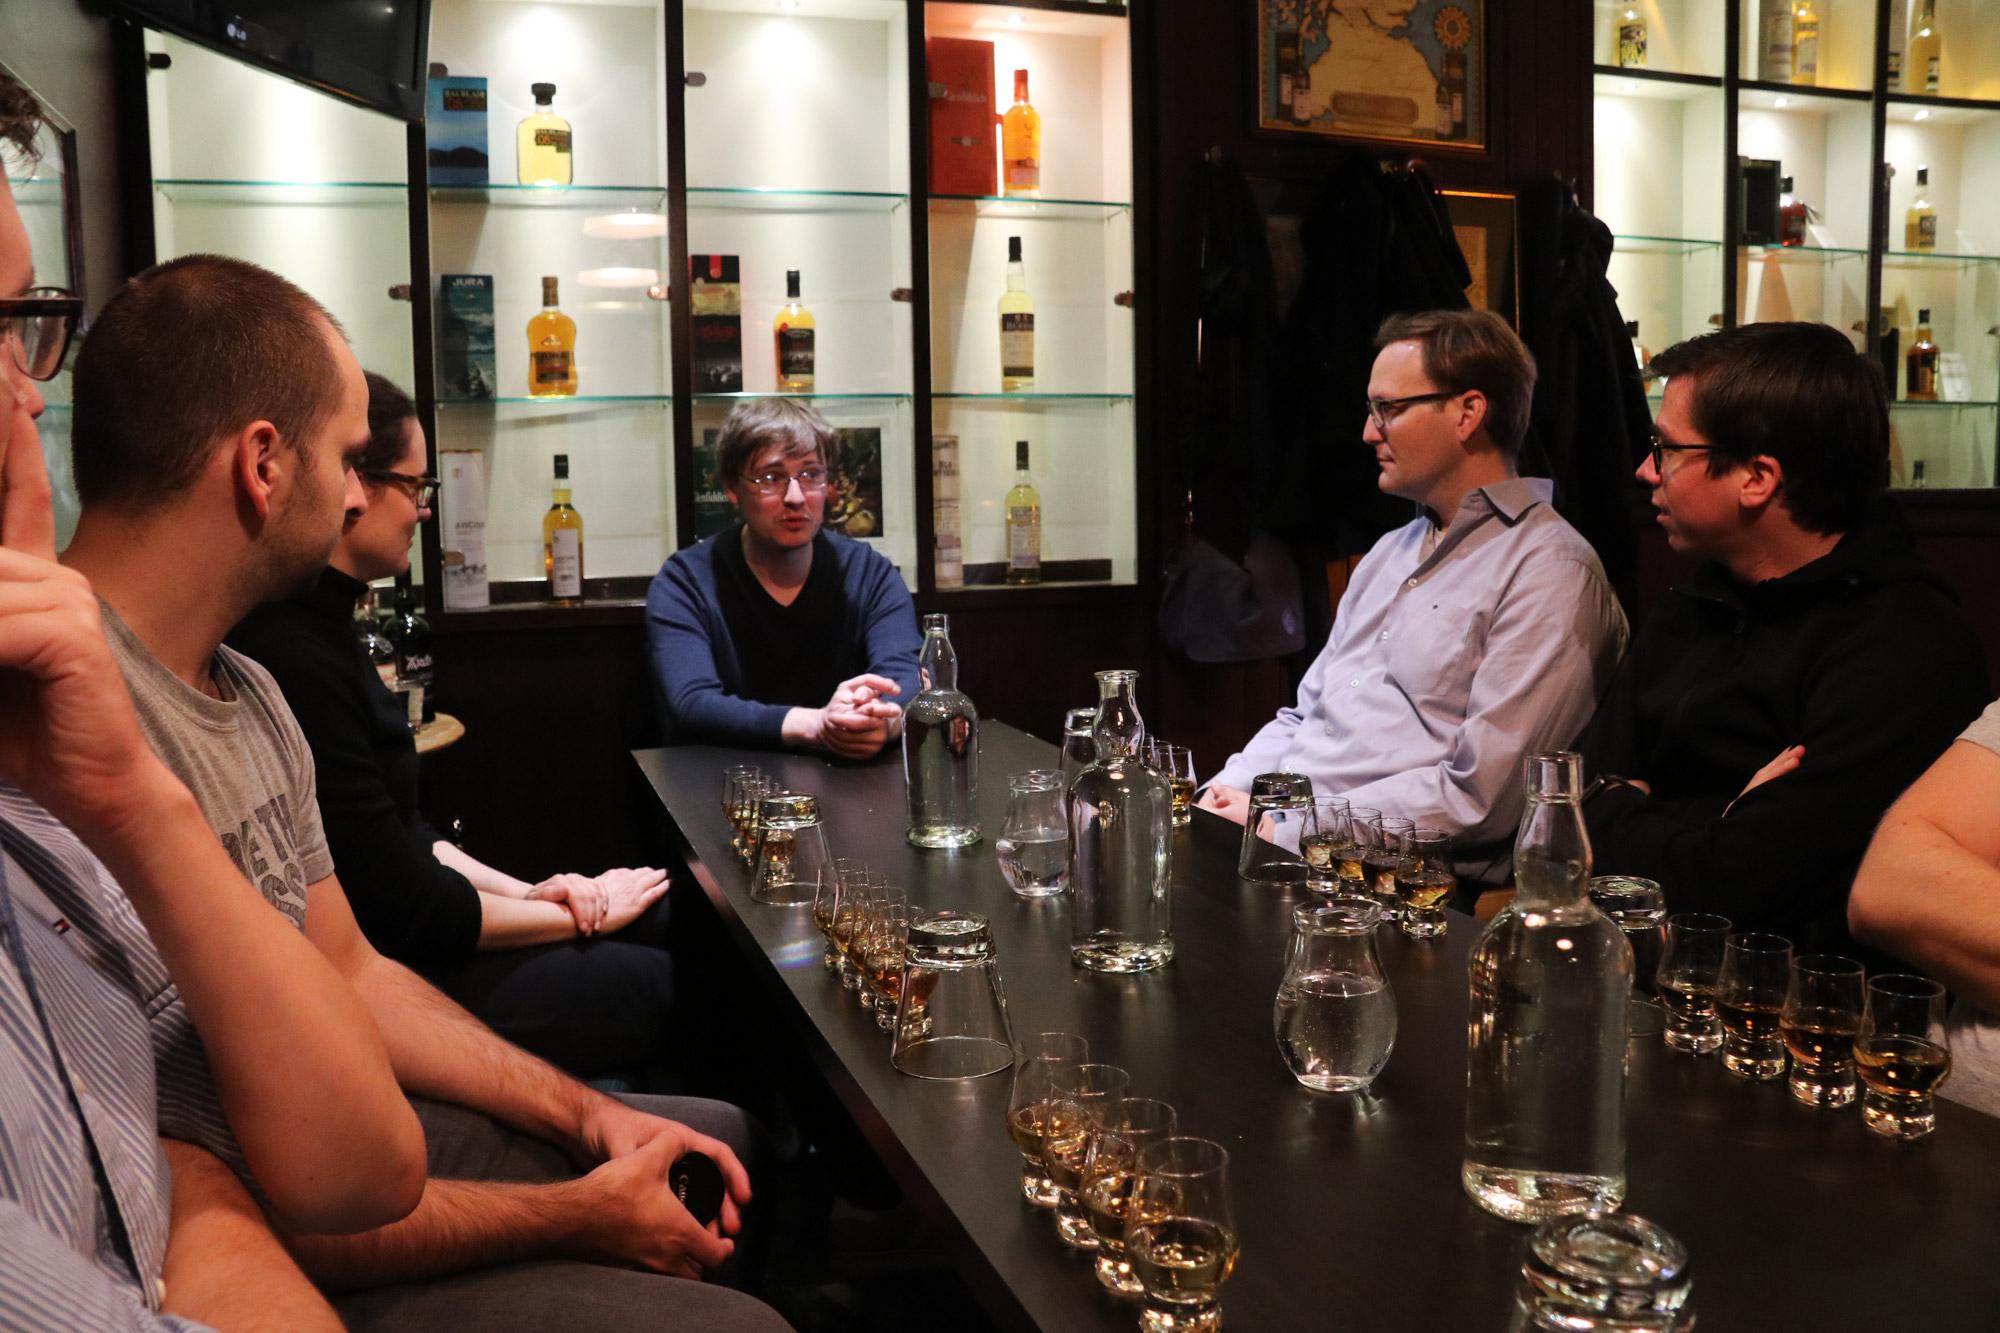 Mannenweekend Edinburgh - Whisky proeverij